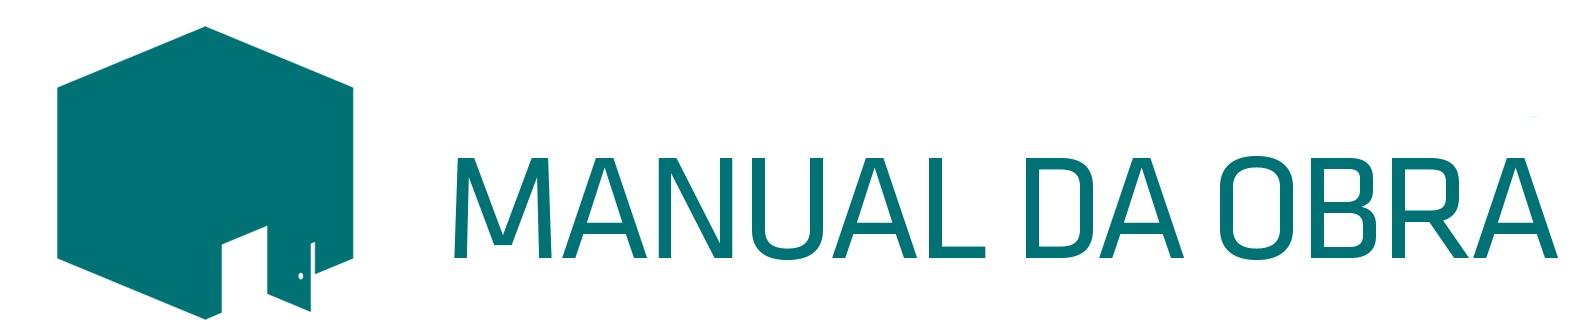 Manual_Logo_Op4.jpg